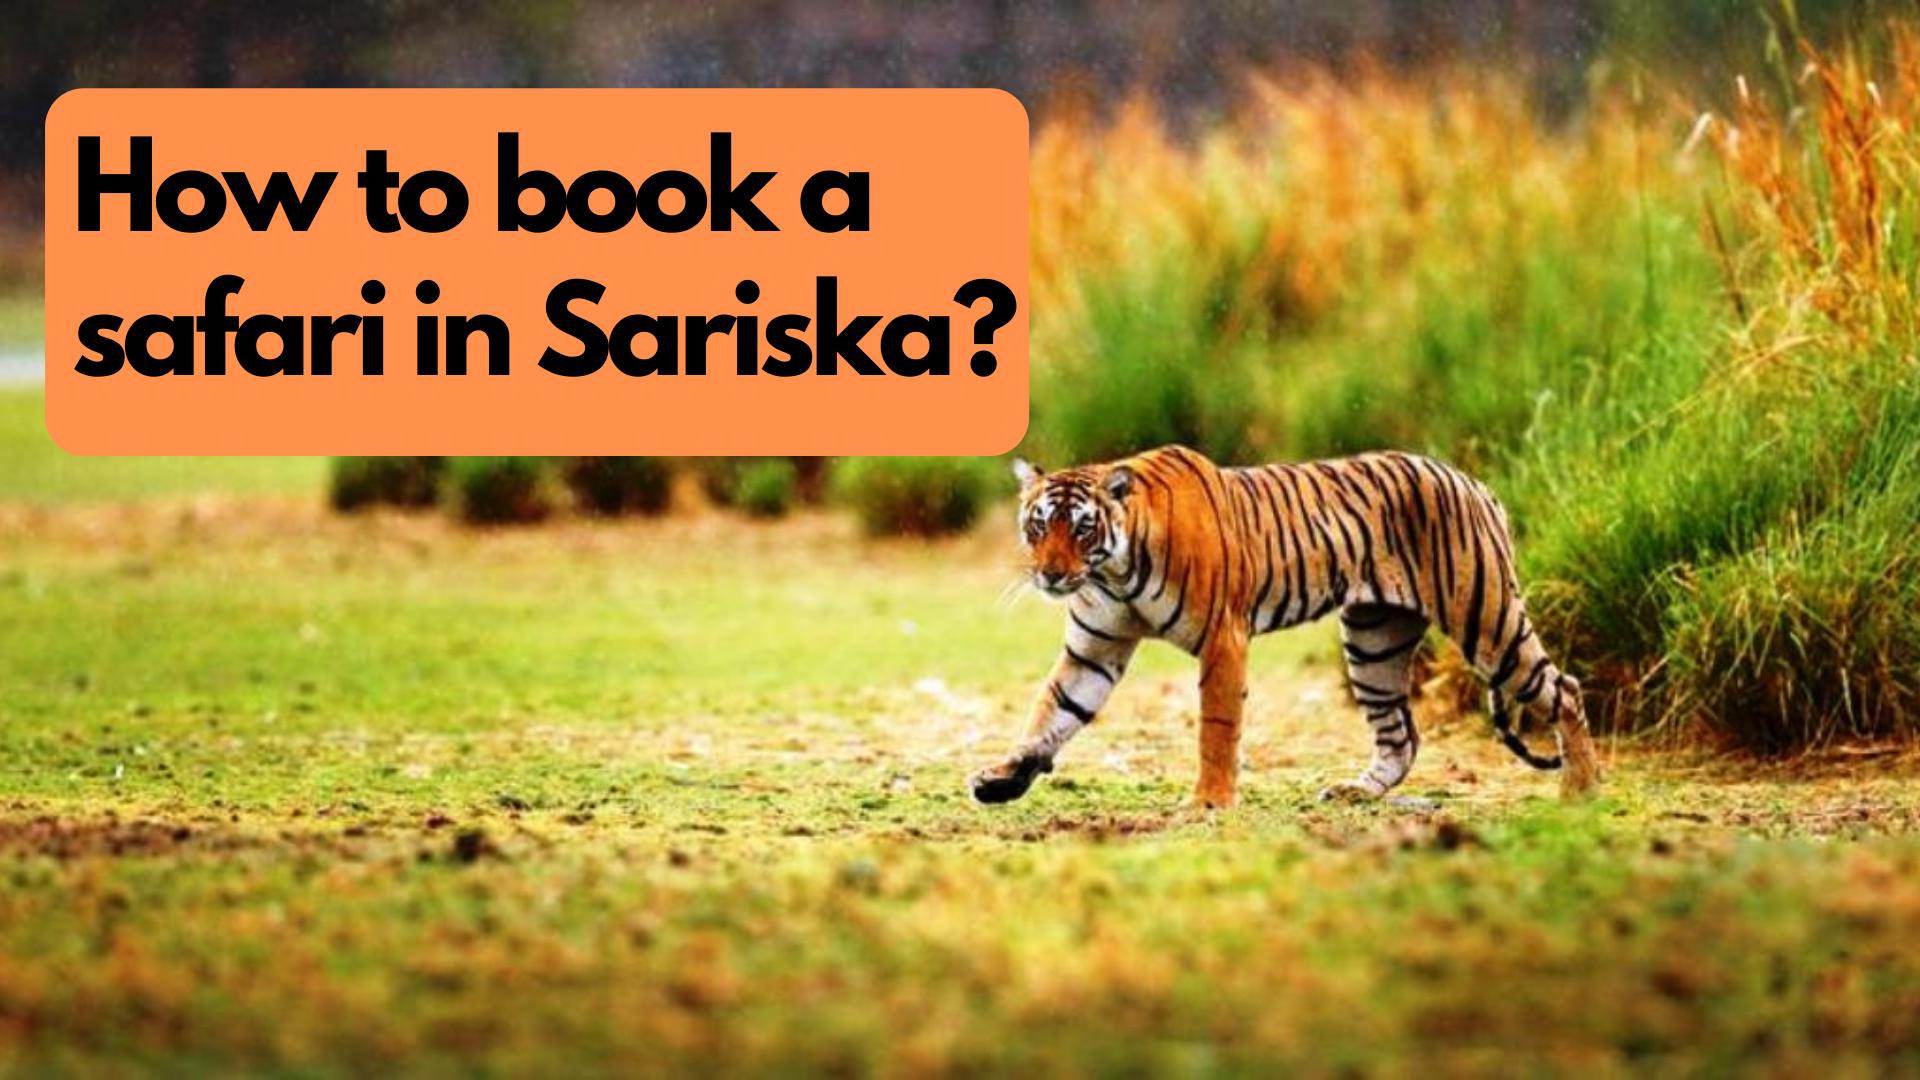 How to book a safari in Sariska?